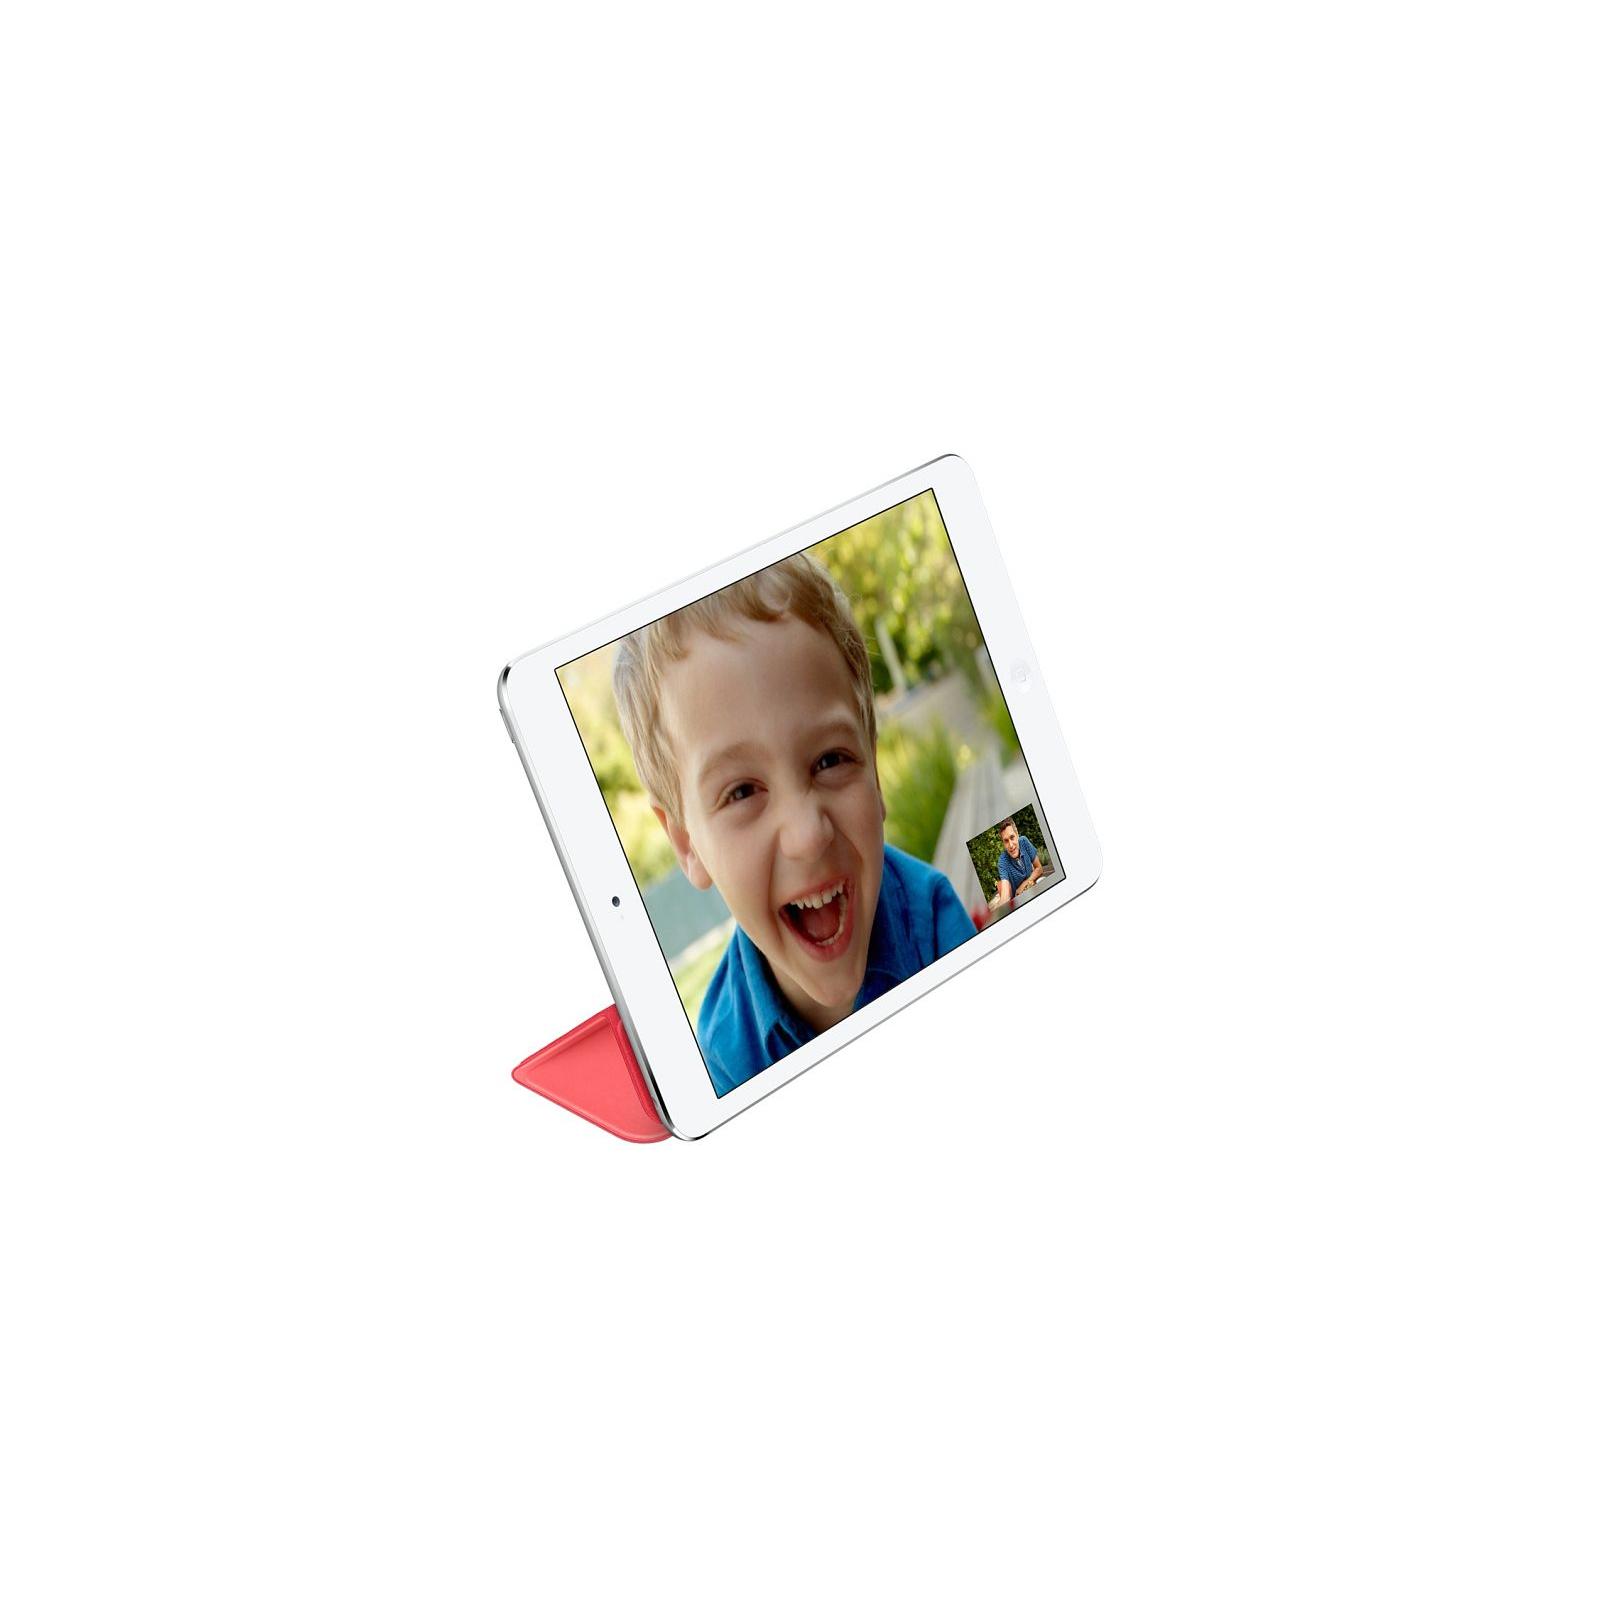 Чехол для планшета Apple Smart Cover для iPad mini /pink (MF061ZM/A) изображение 5